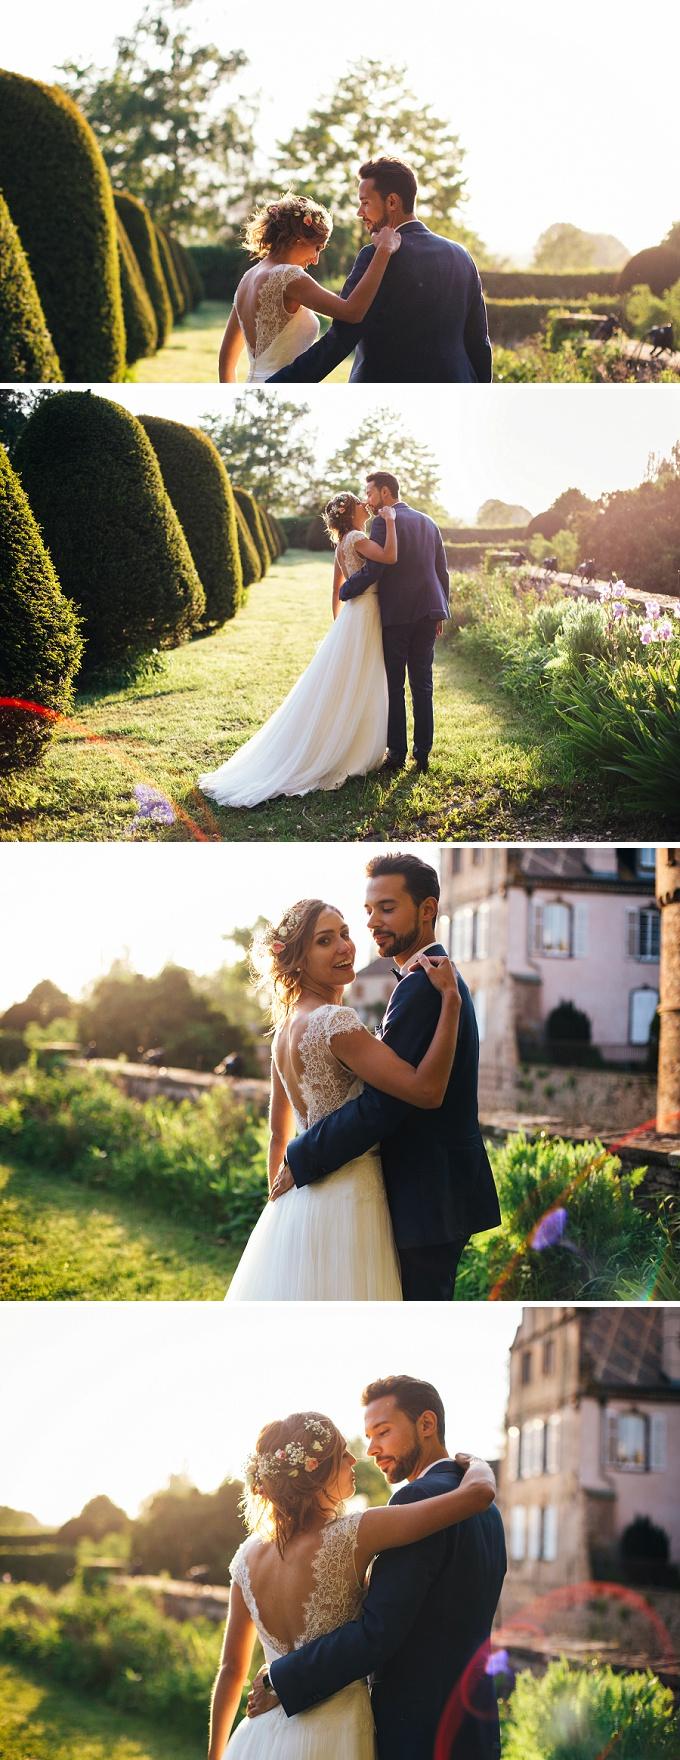 mariage-chateau-dosthoffen-026.jpg